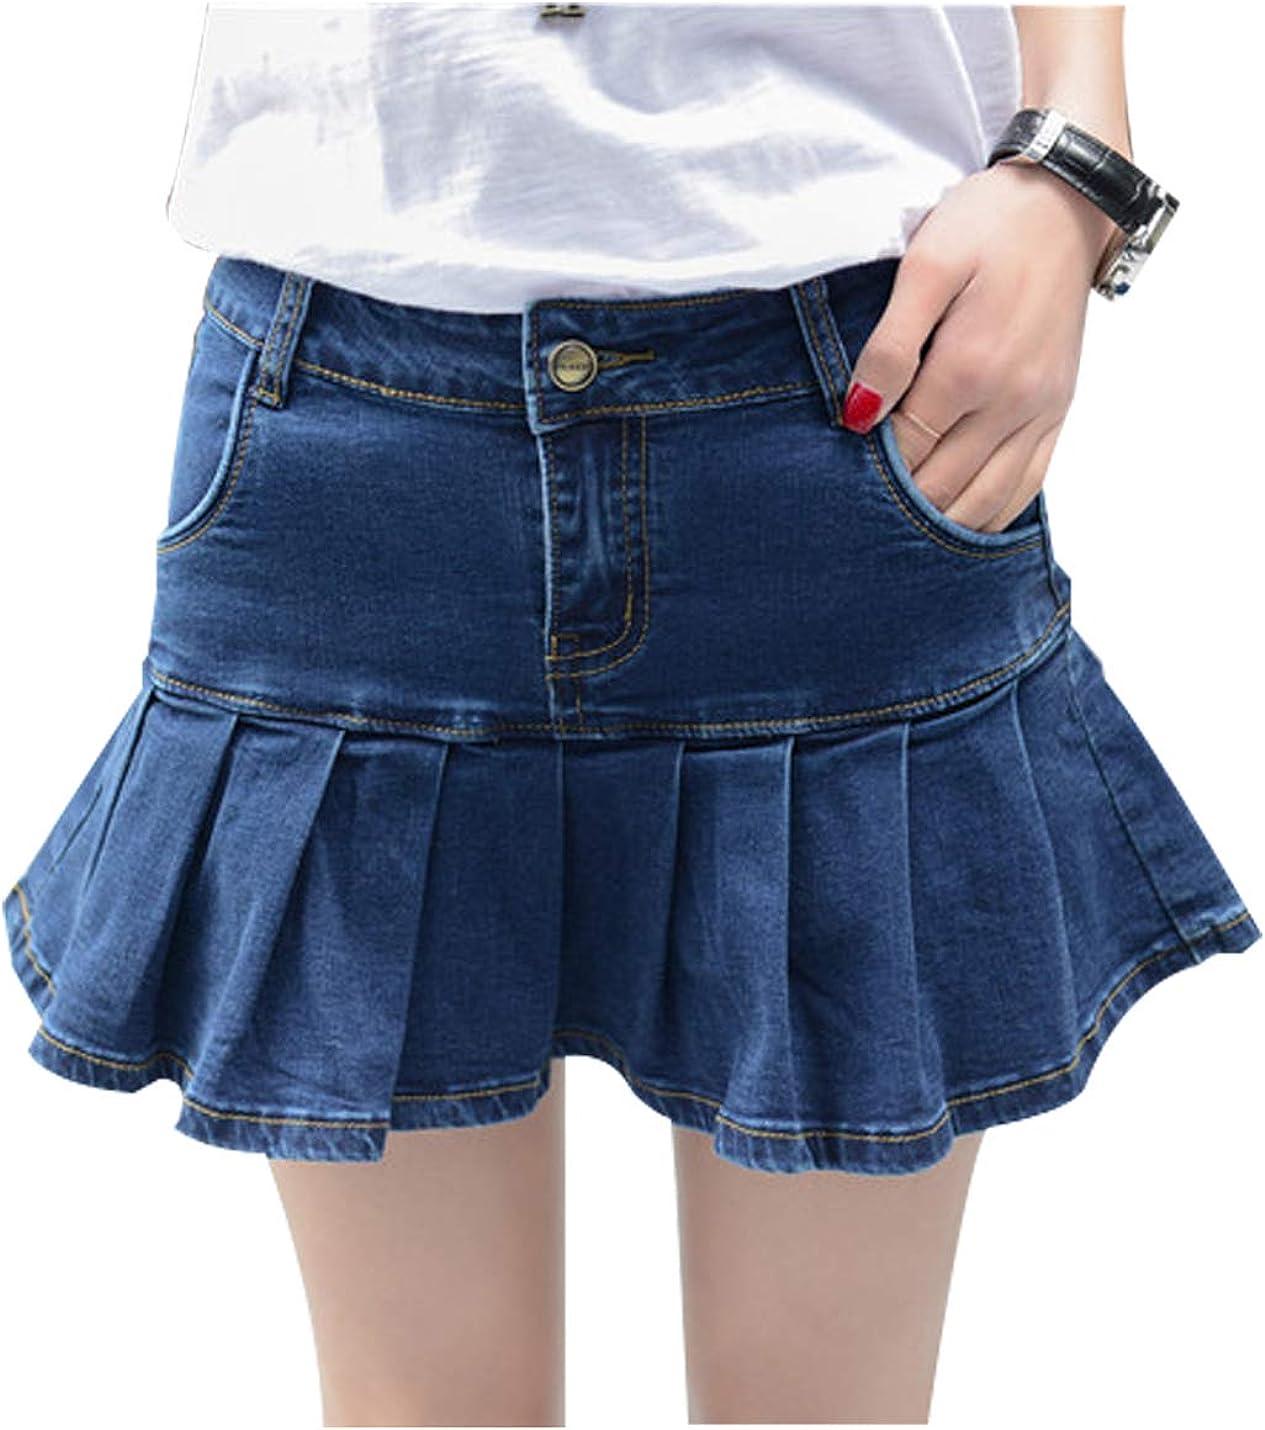 Tanming Women's Fashion Slim A Line Ruffle Swing Pleated Denim Mini Short Skirts (Blue01, S)